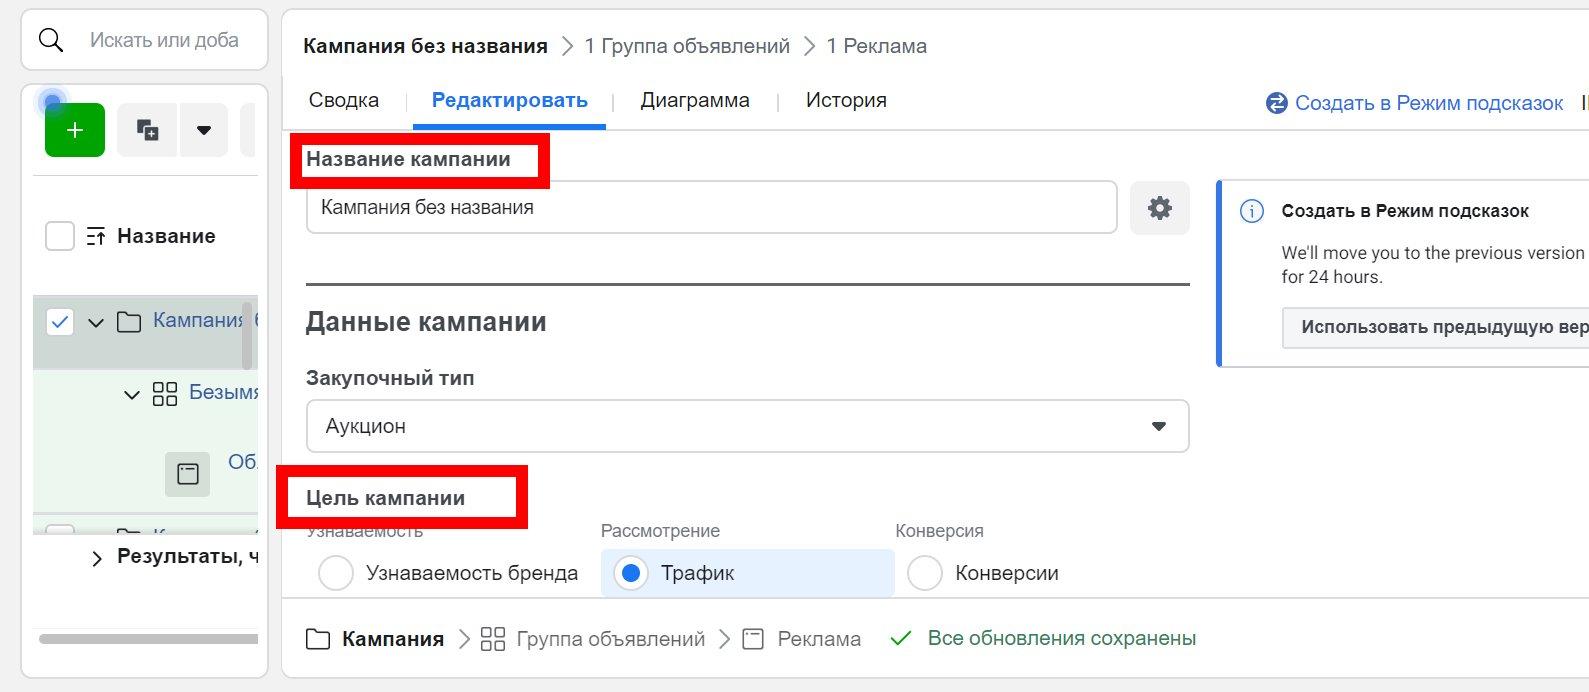 FB_kak_priviazat_inst11.jpg